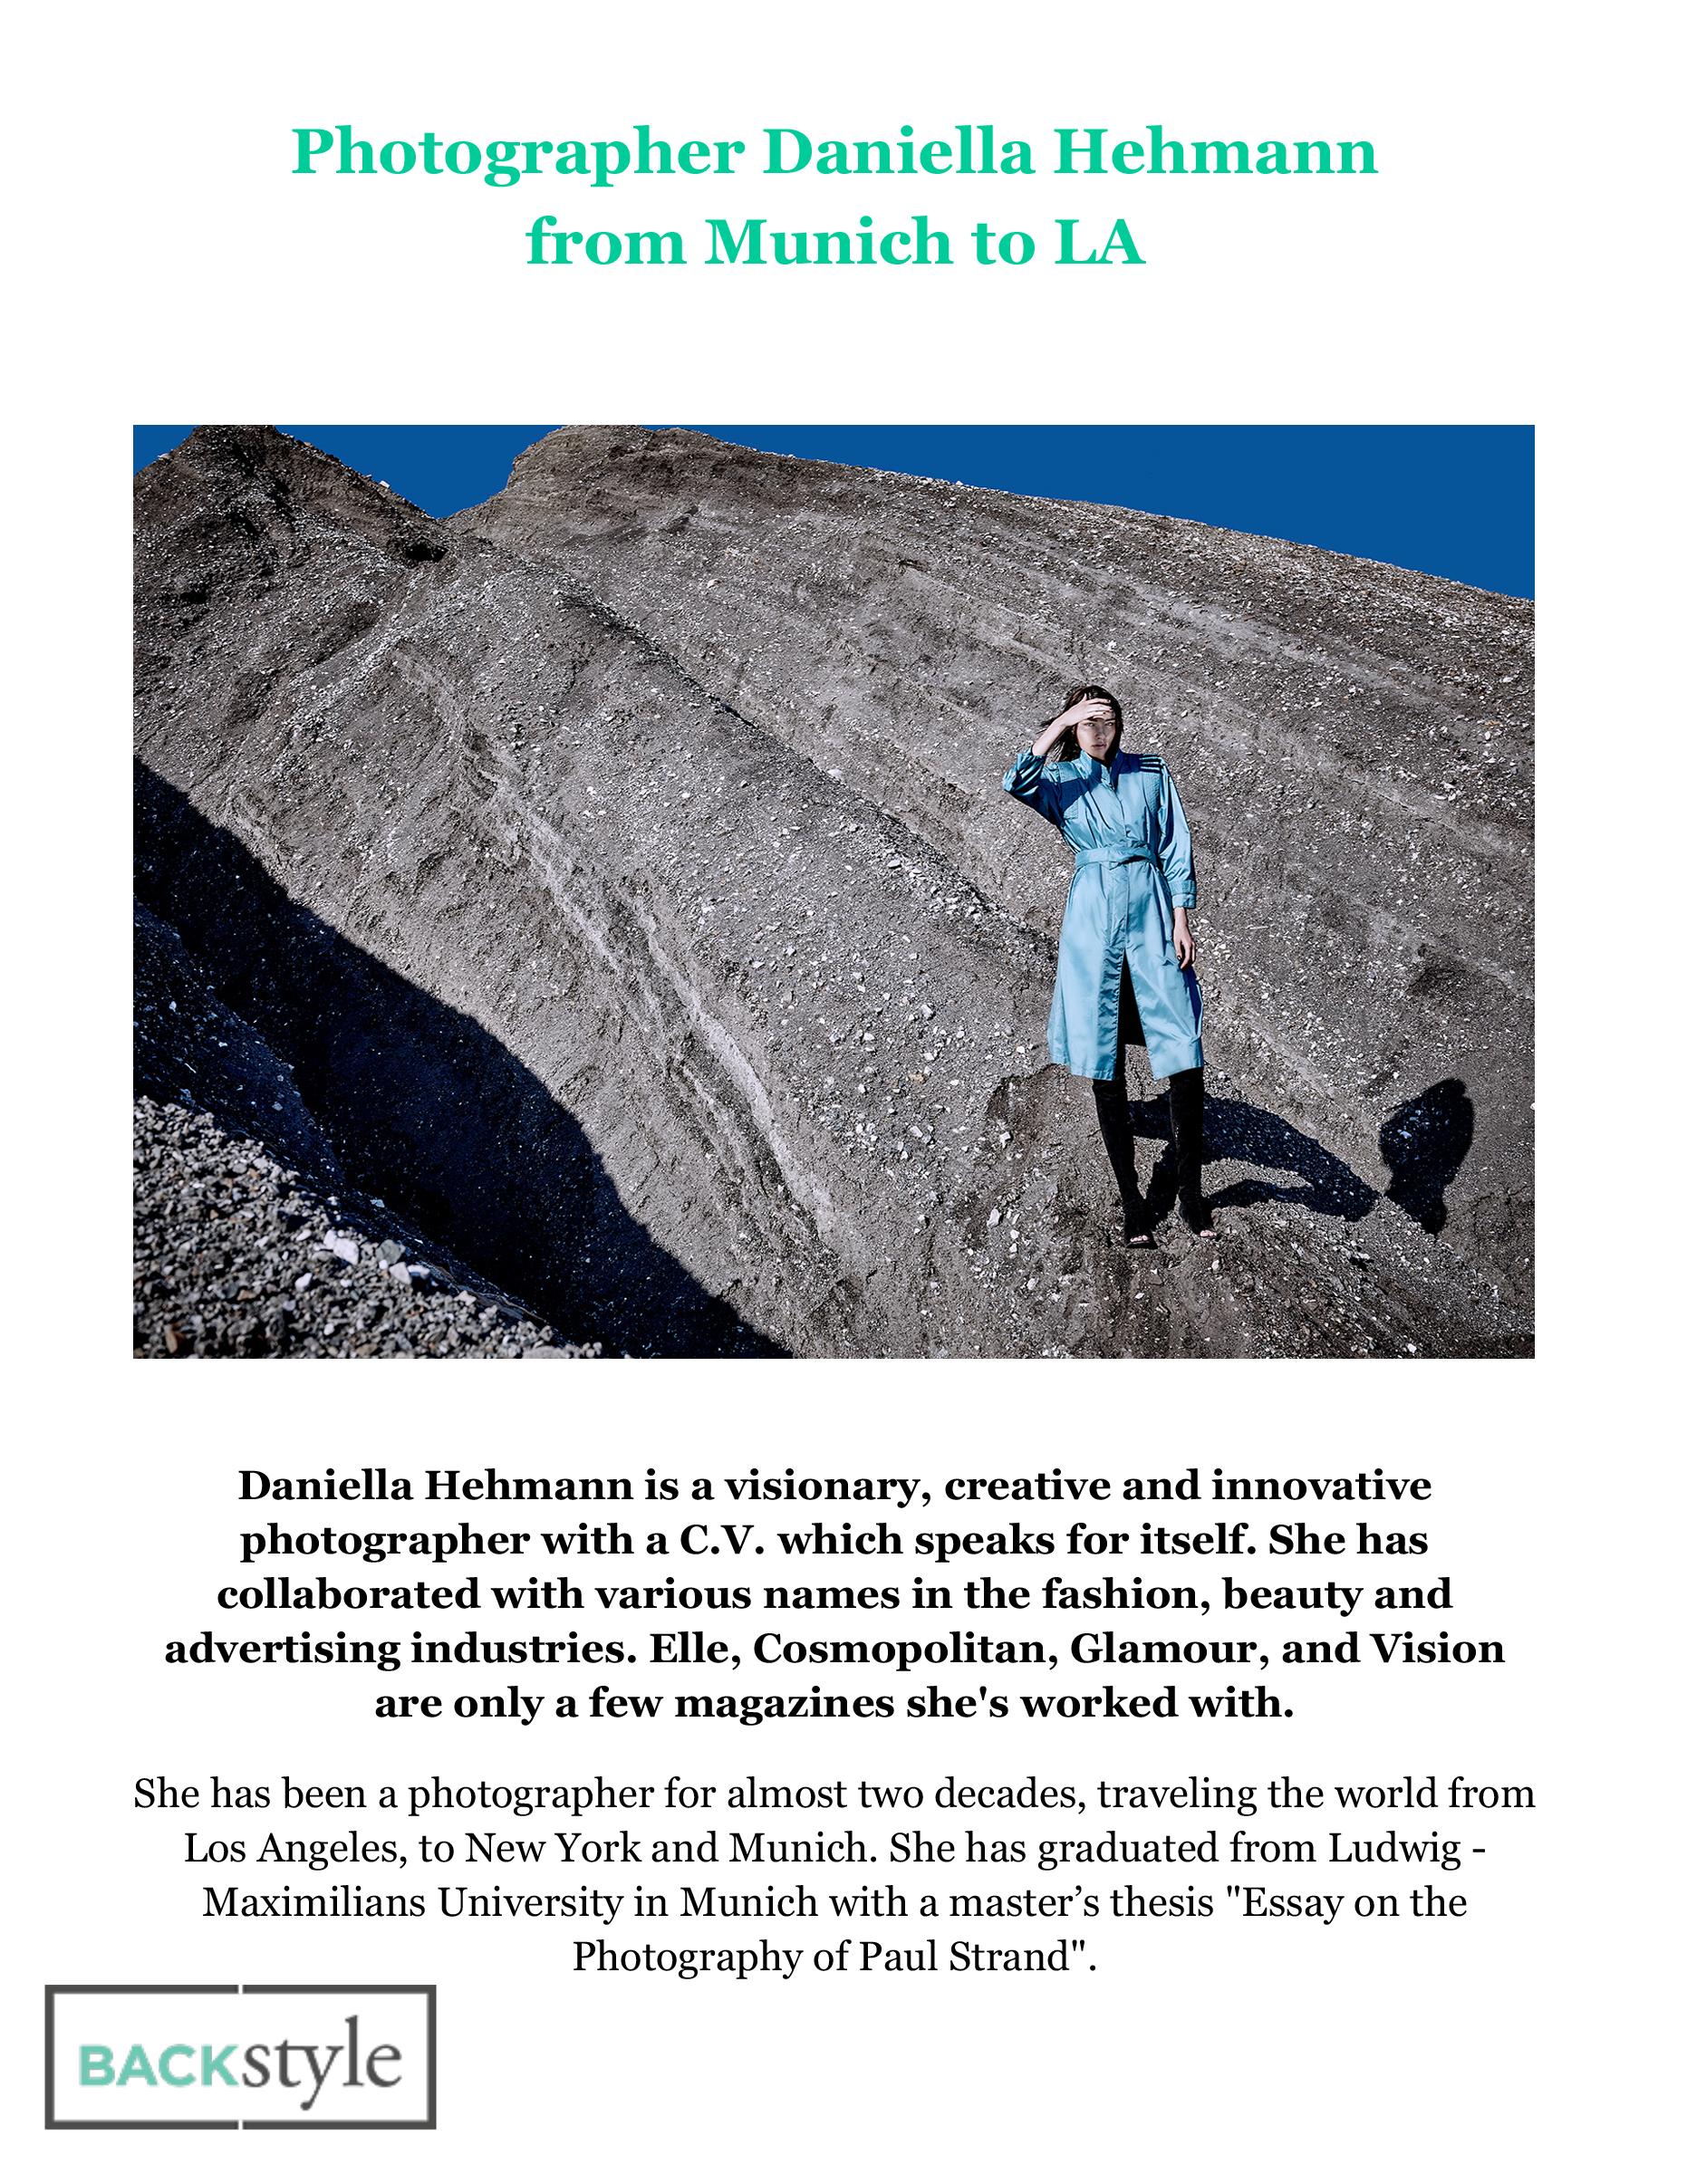 Daniella-Hehmann-Photography-Interview--backstyle-01.jpg